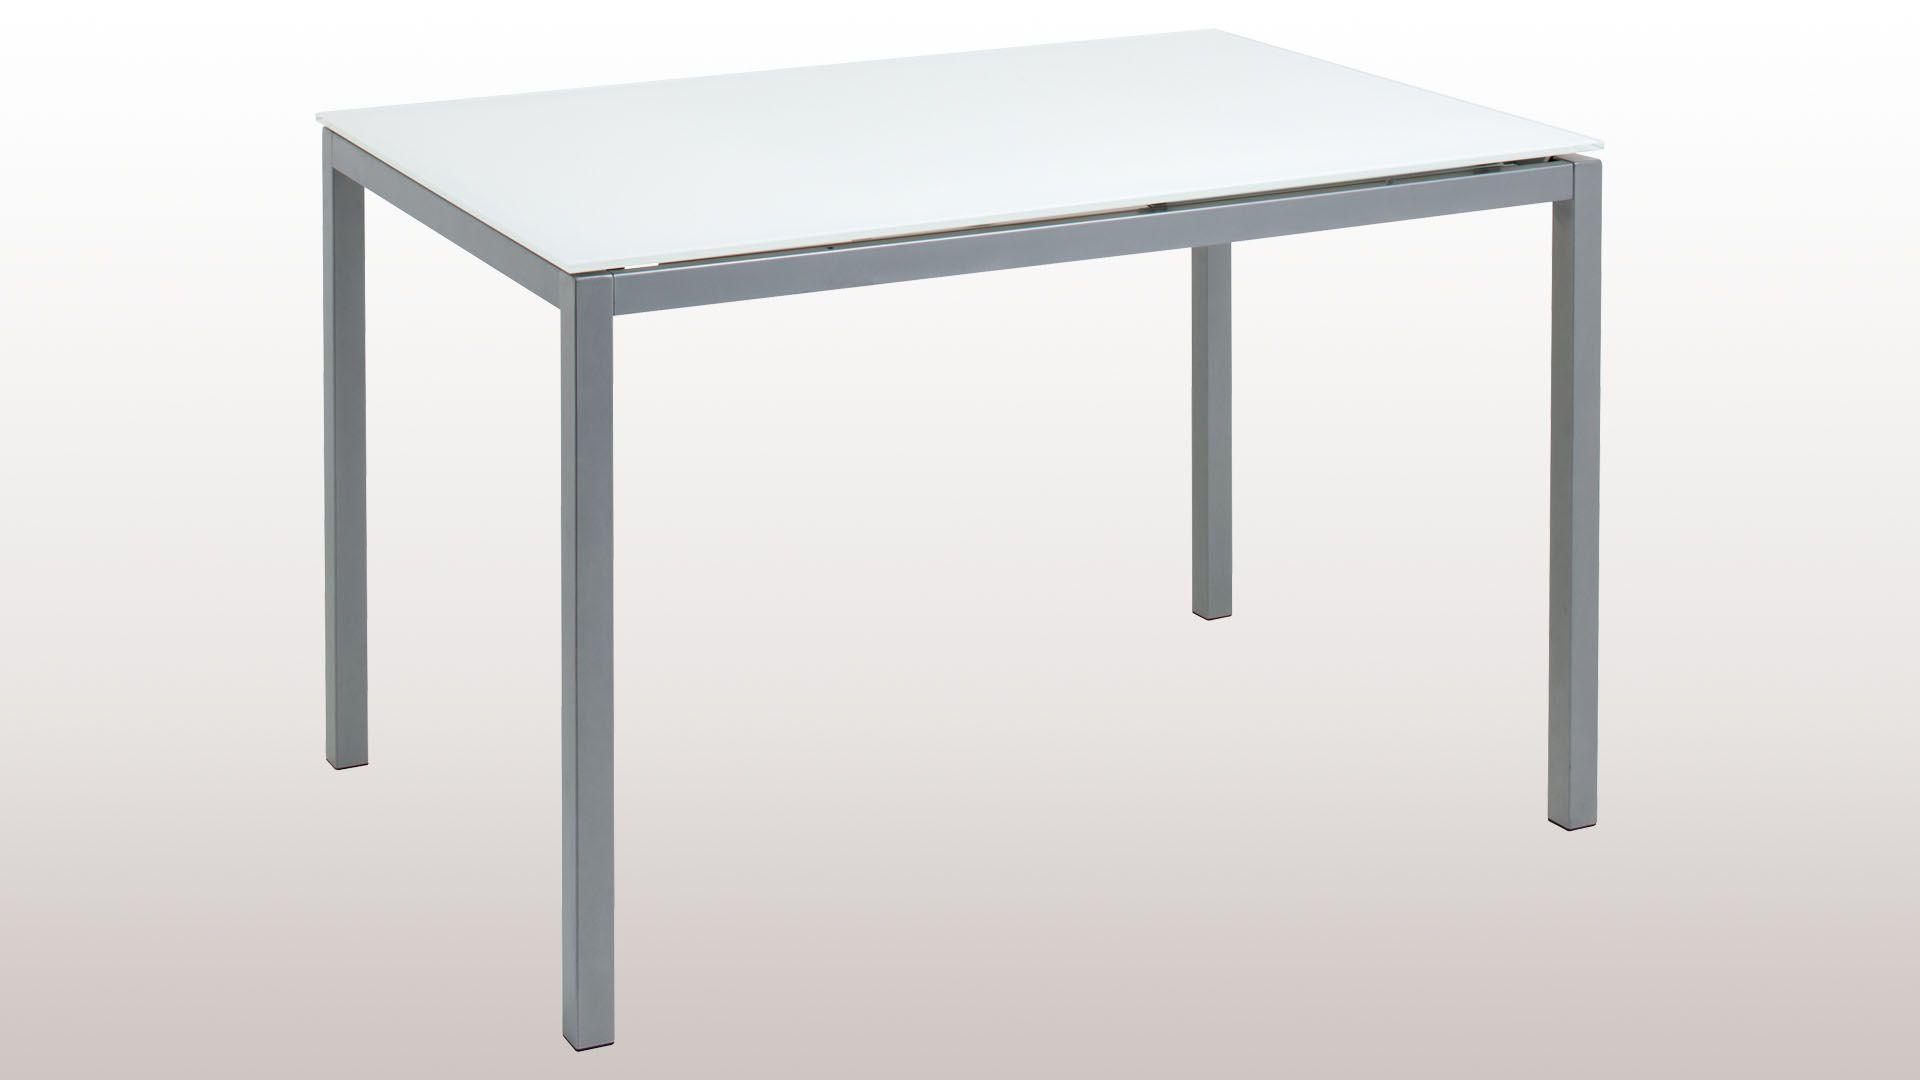 235e0d698ecf012b125e885c5f808942 Incroyable De Banc D Entrée Ikea Schème